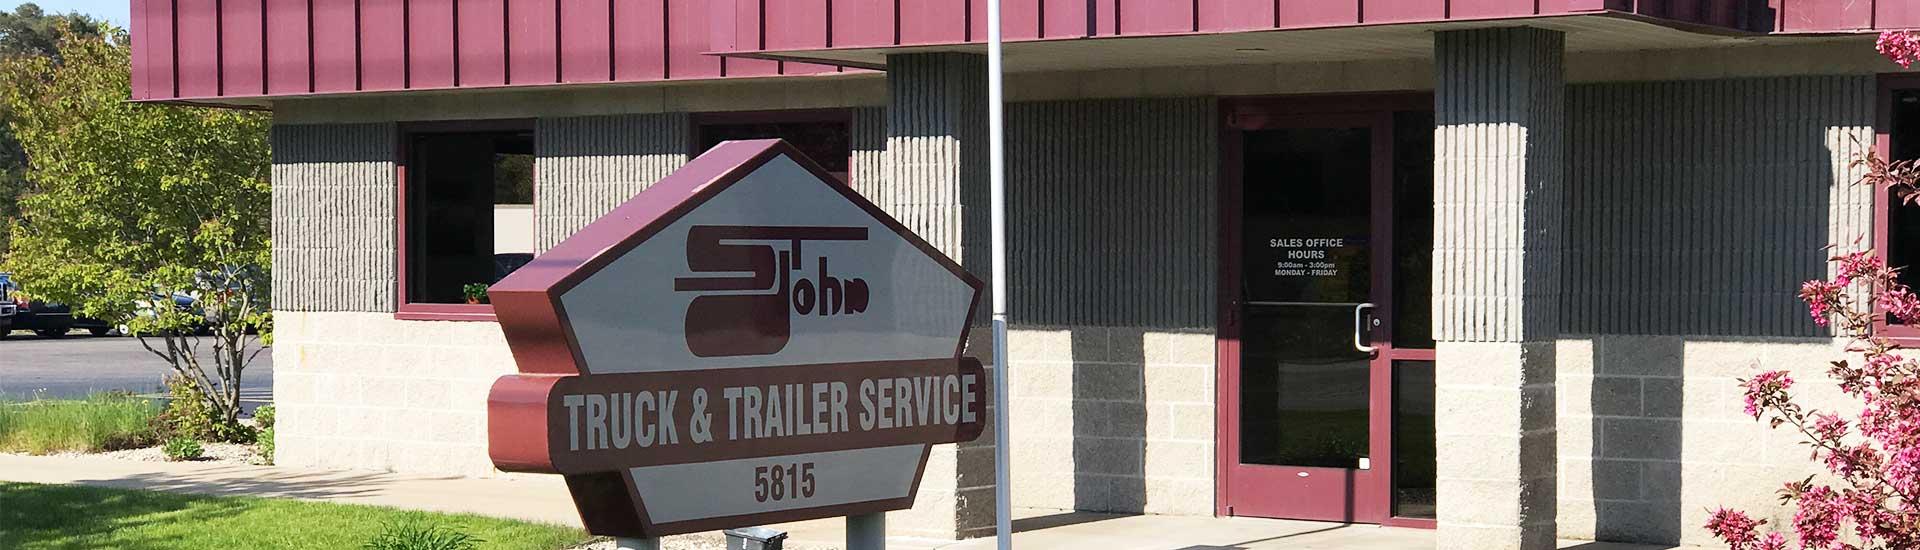 st-john-truck-&-trailer-service-muskegon-mi